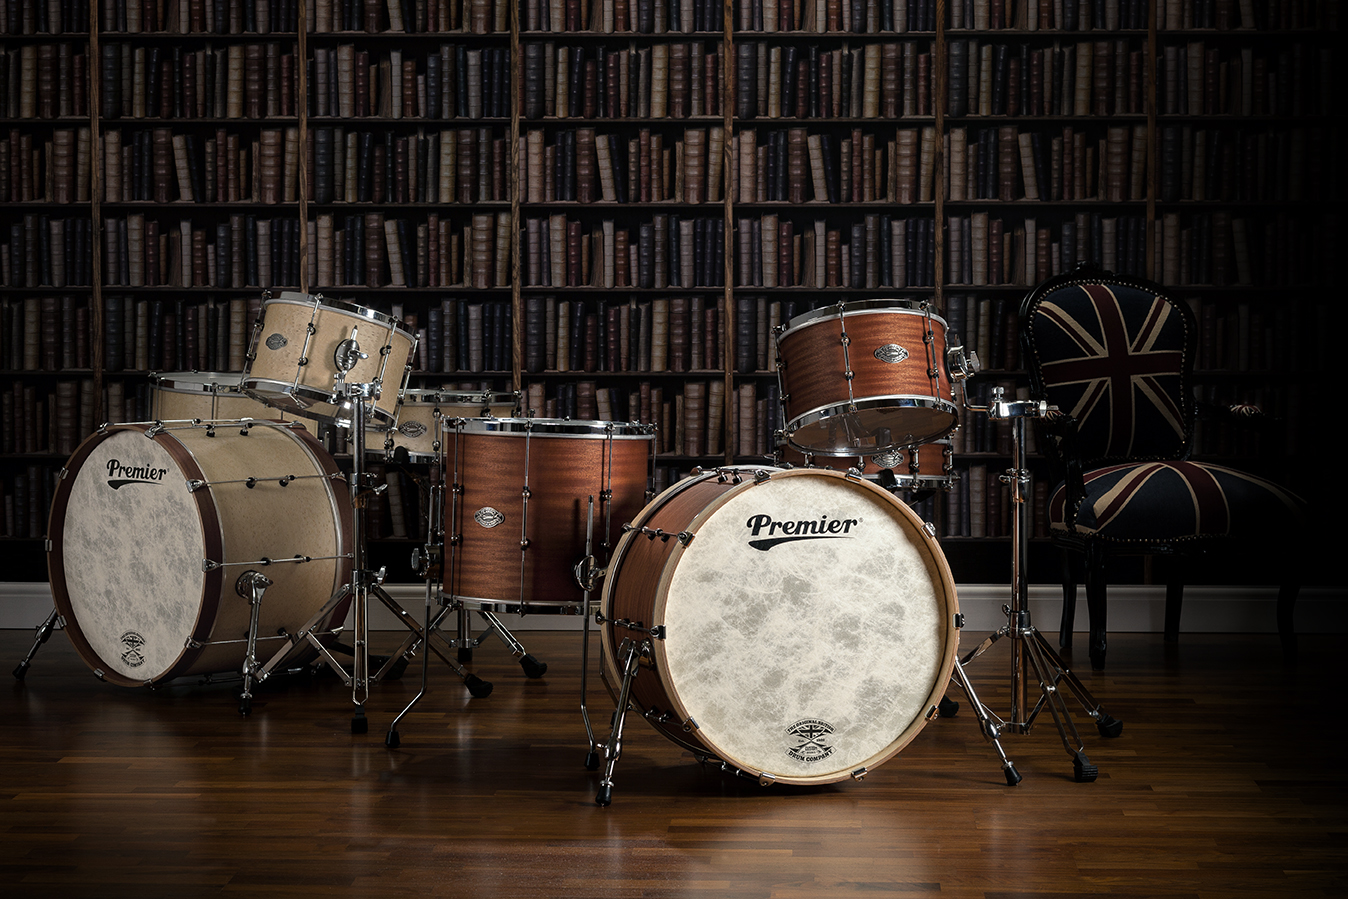 Premier British-Made Modern Classic Drumset